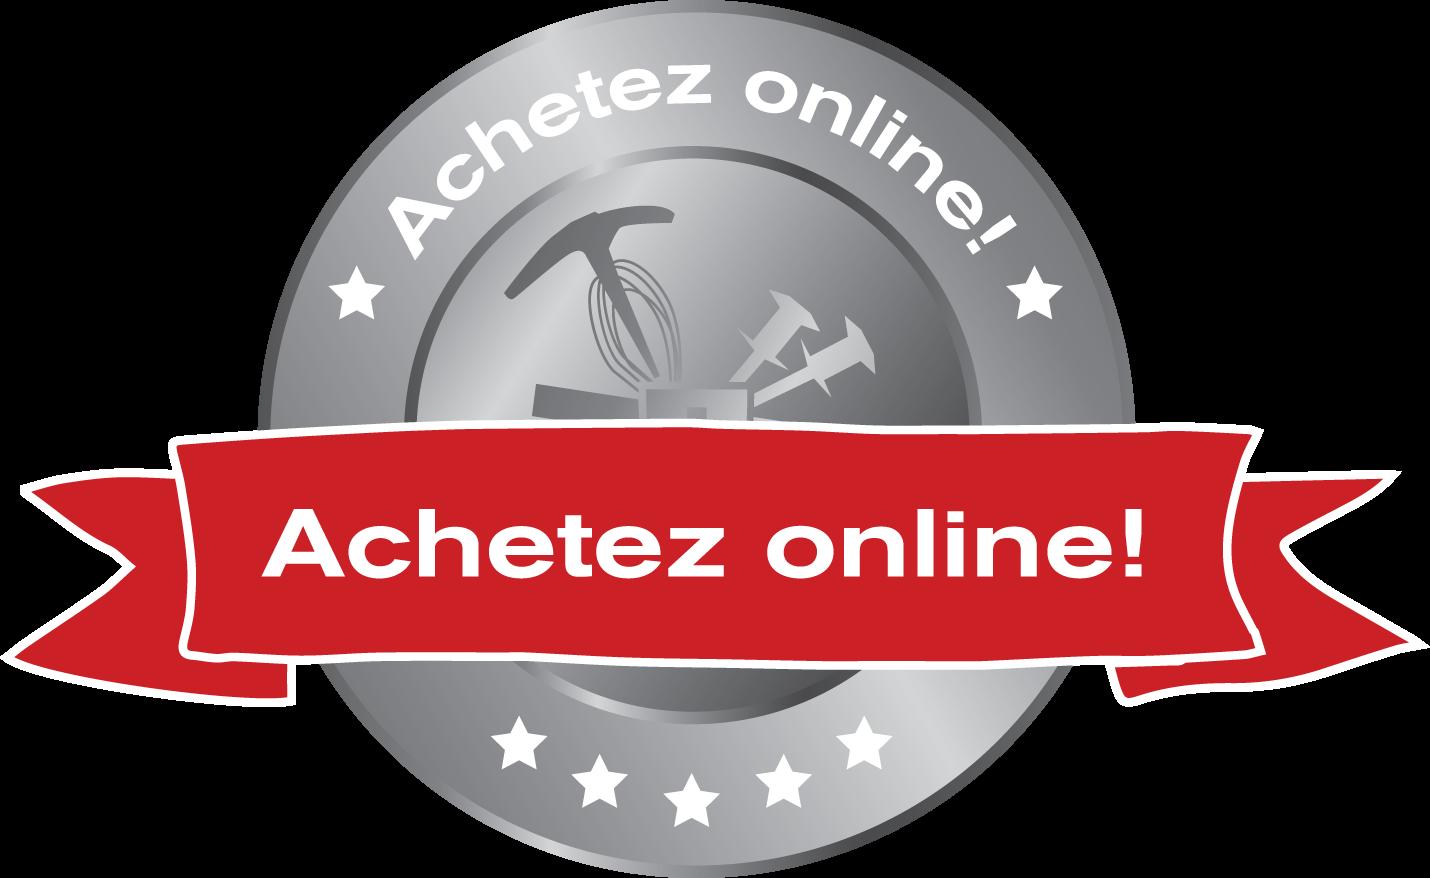 Achetez online Skipass Saas-Fee